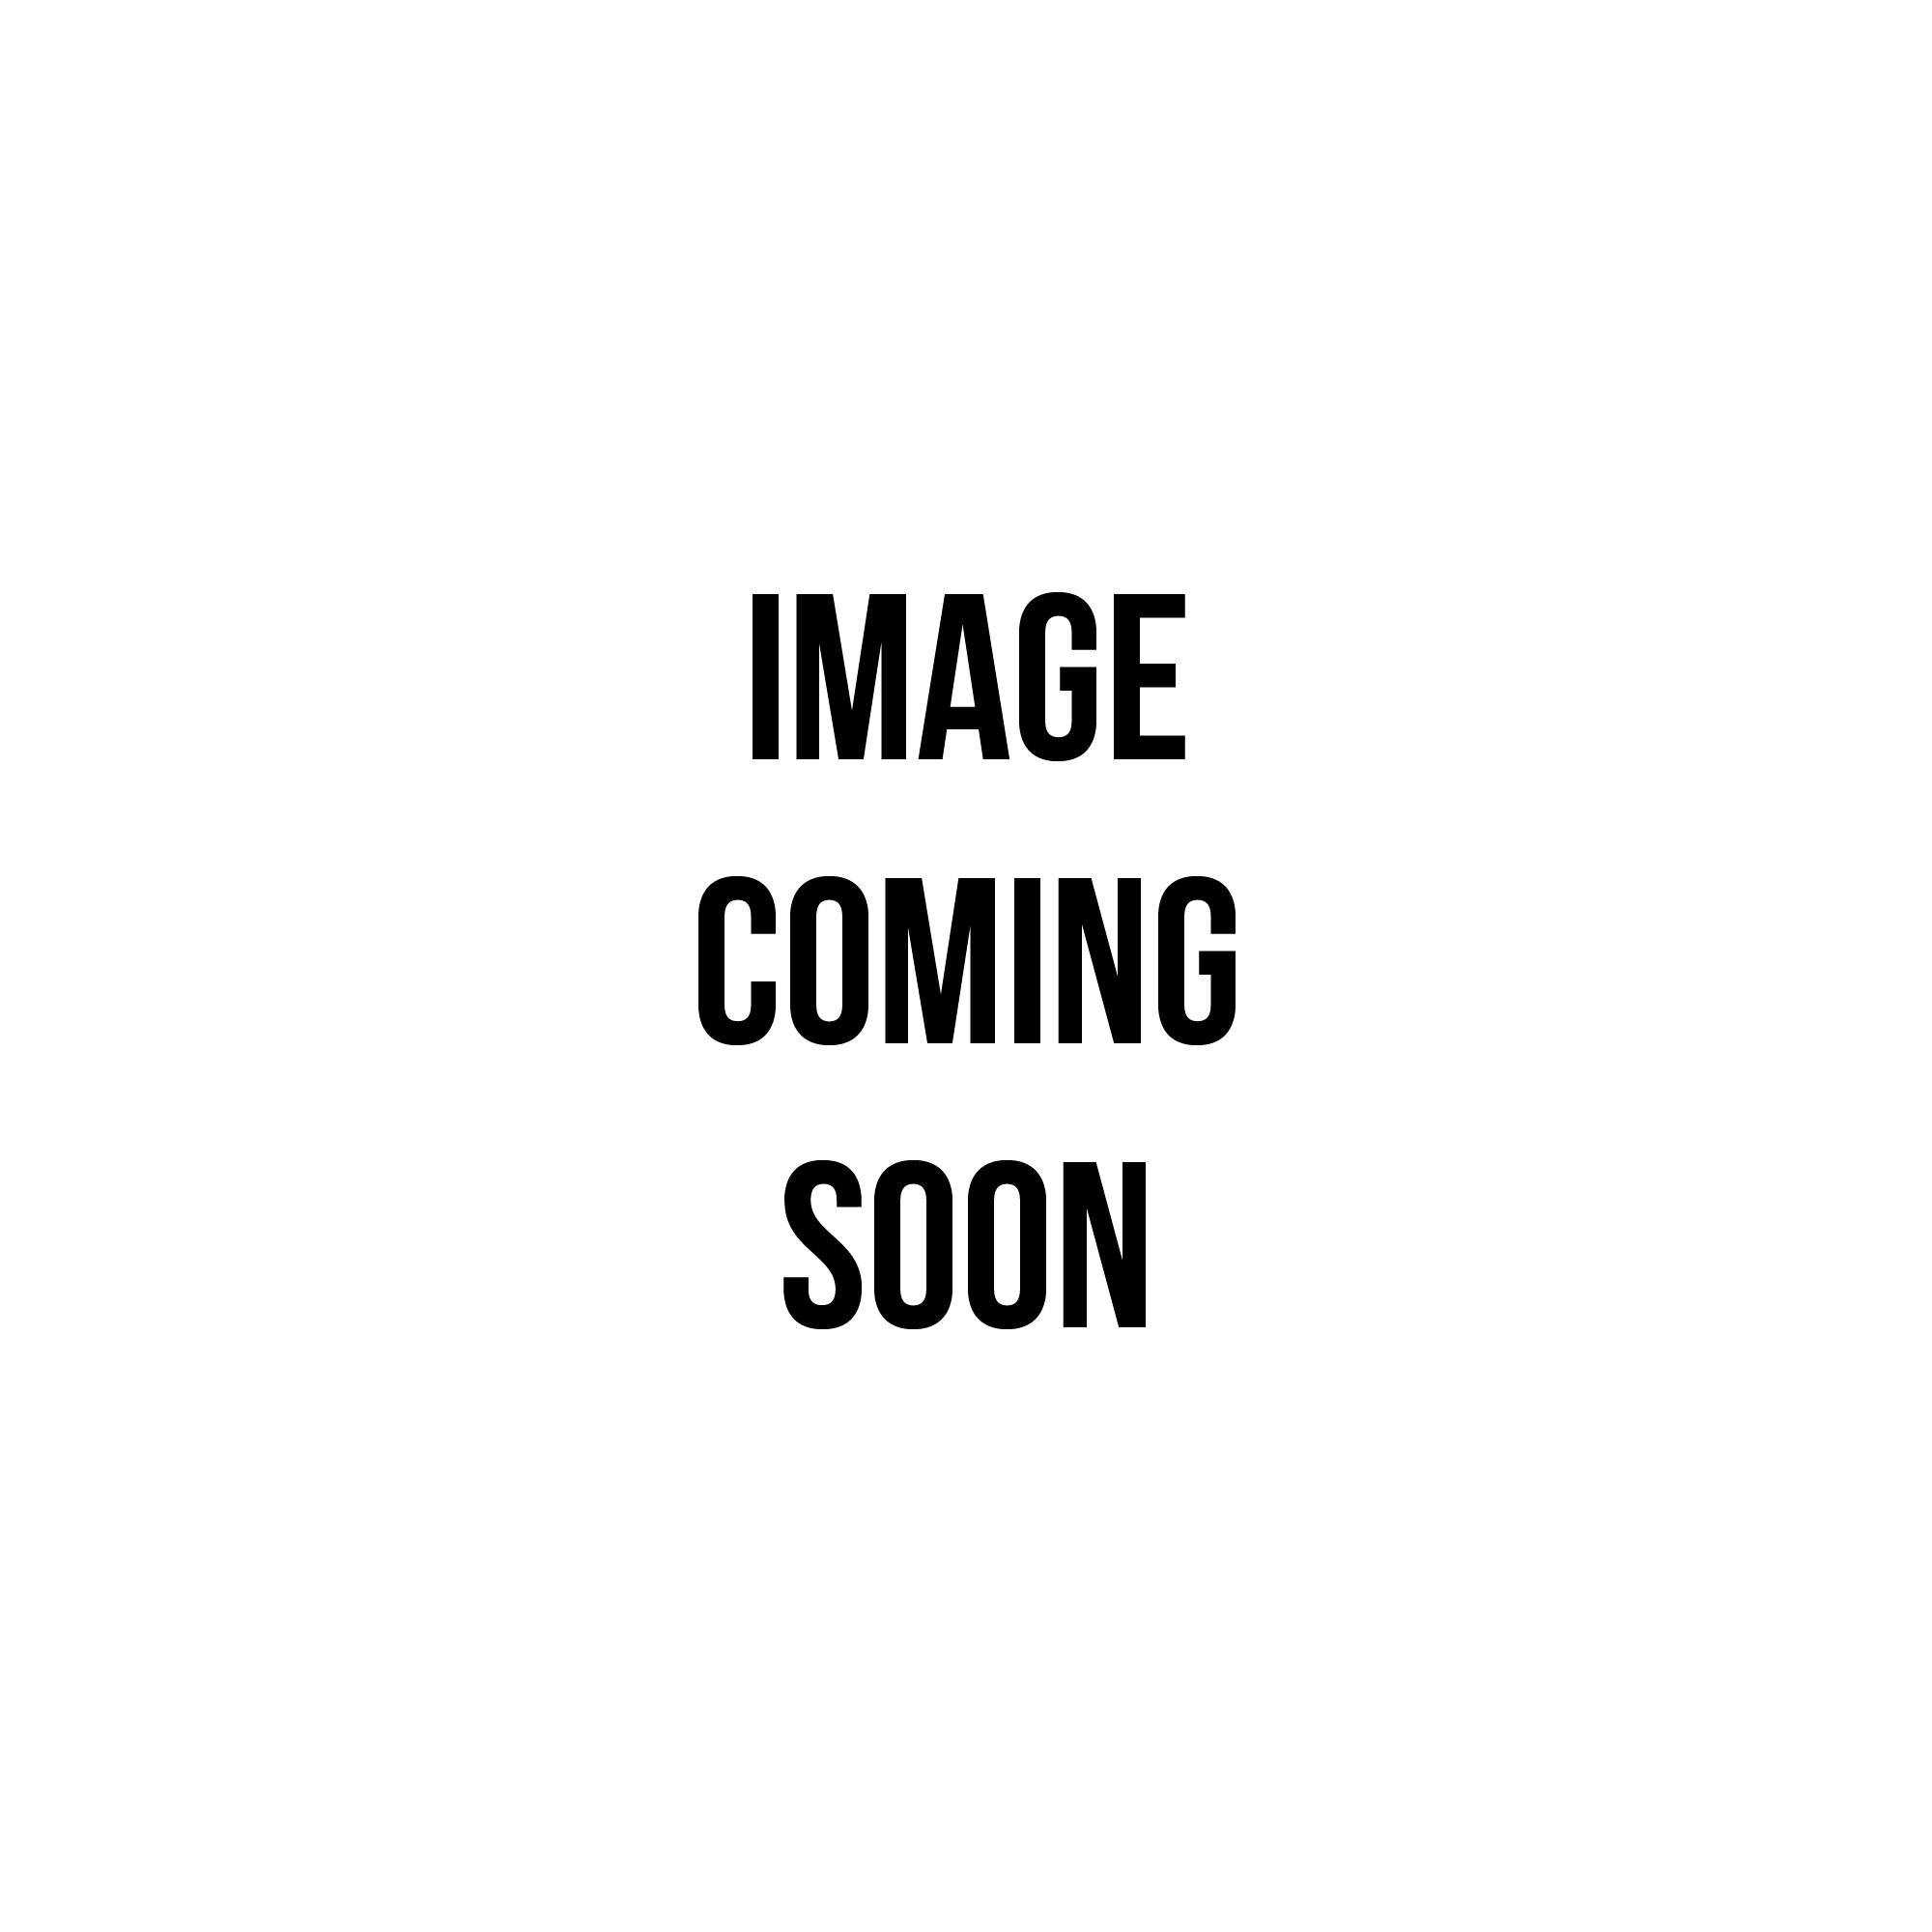 descuento especial Nike Stefan Janoski La Goma Negro 11.5 clásico 7rJUFJiEgY